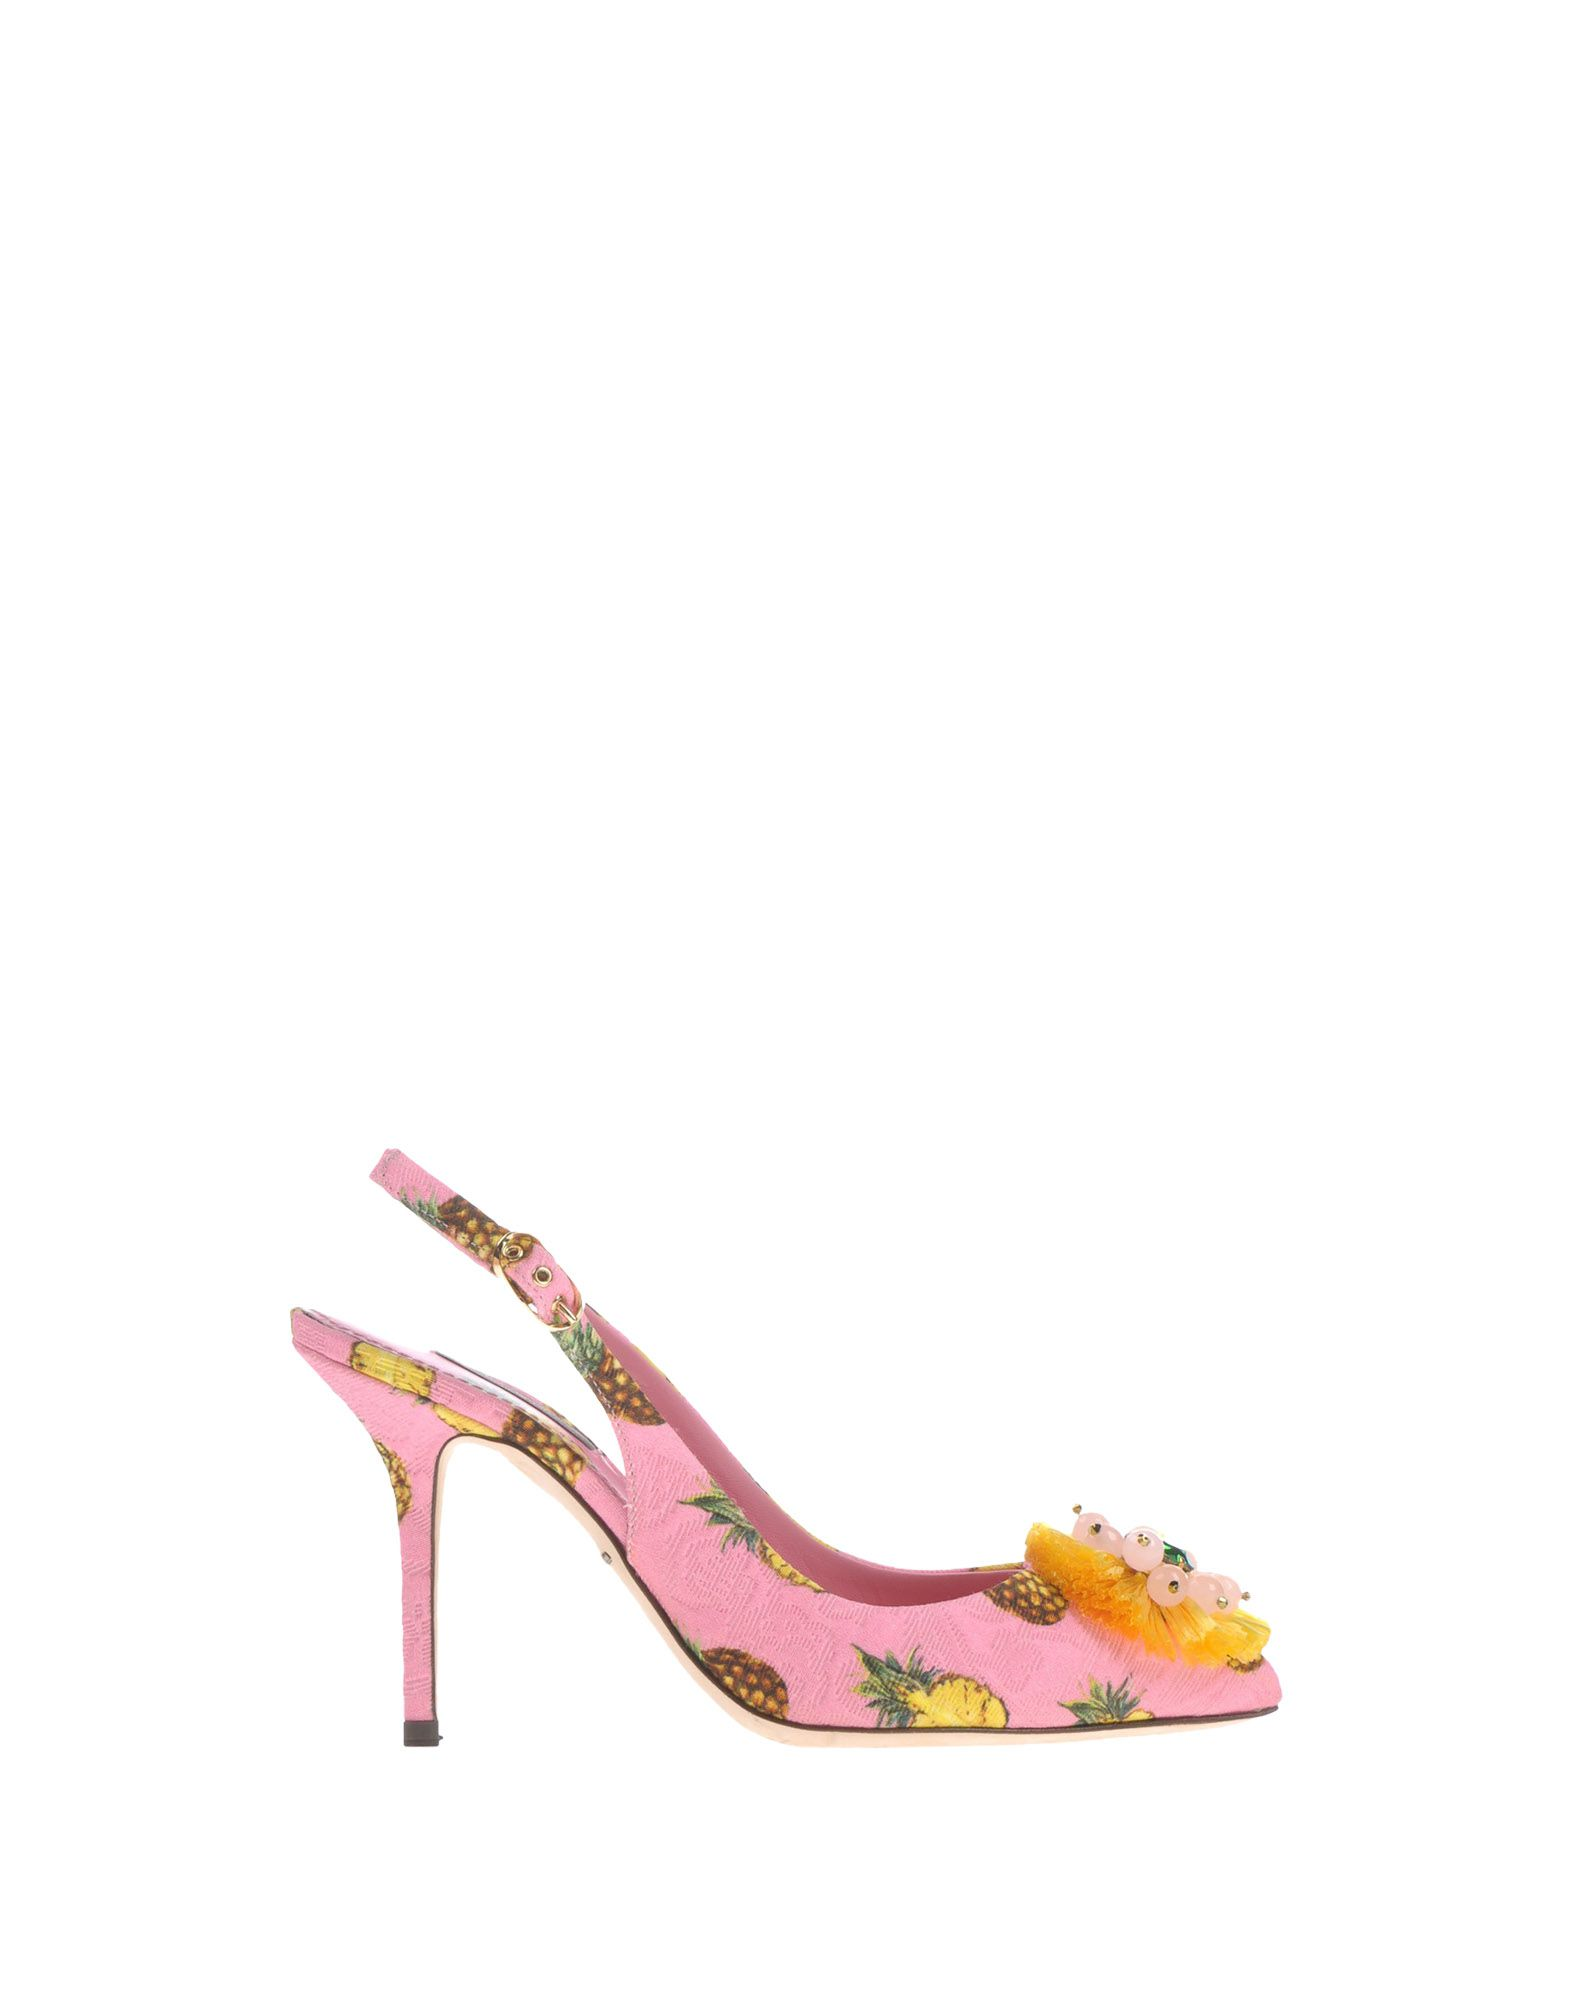 Dolce & Gabbana Pumps Damen Damen Damen  11362871TN Neue Schuhe 123b0a